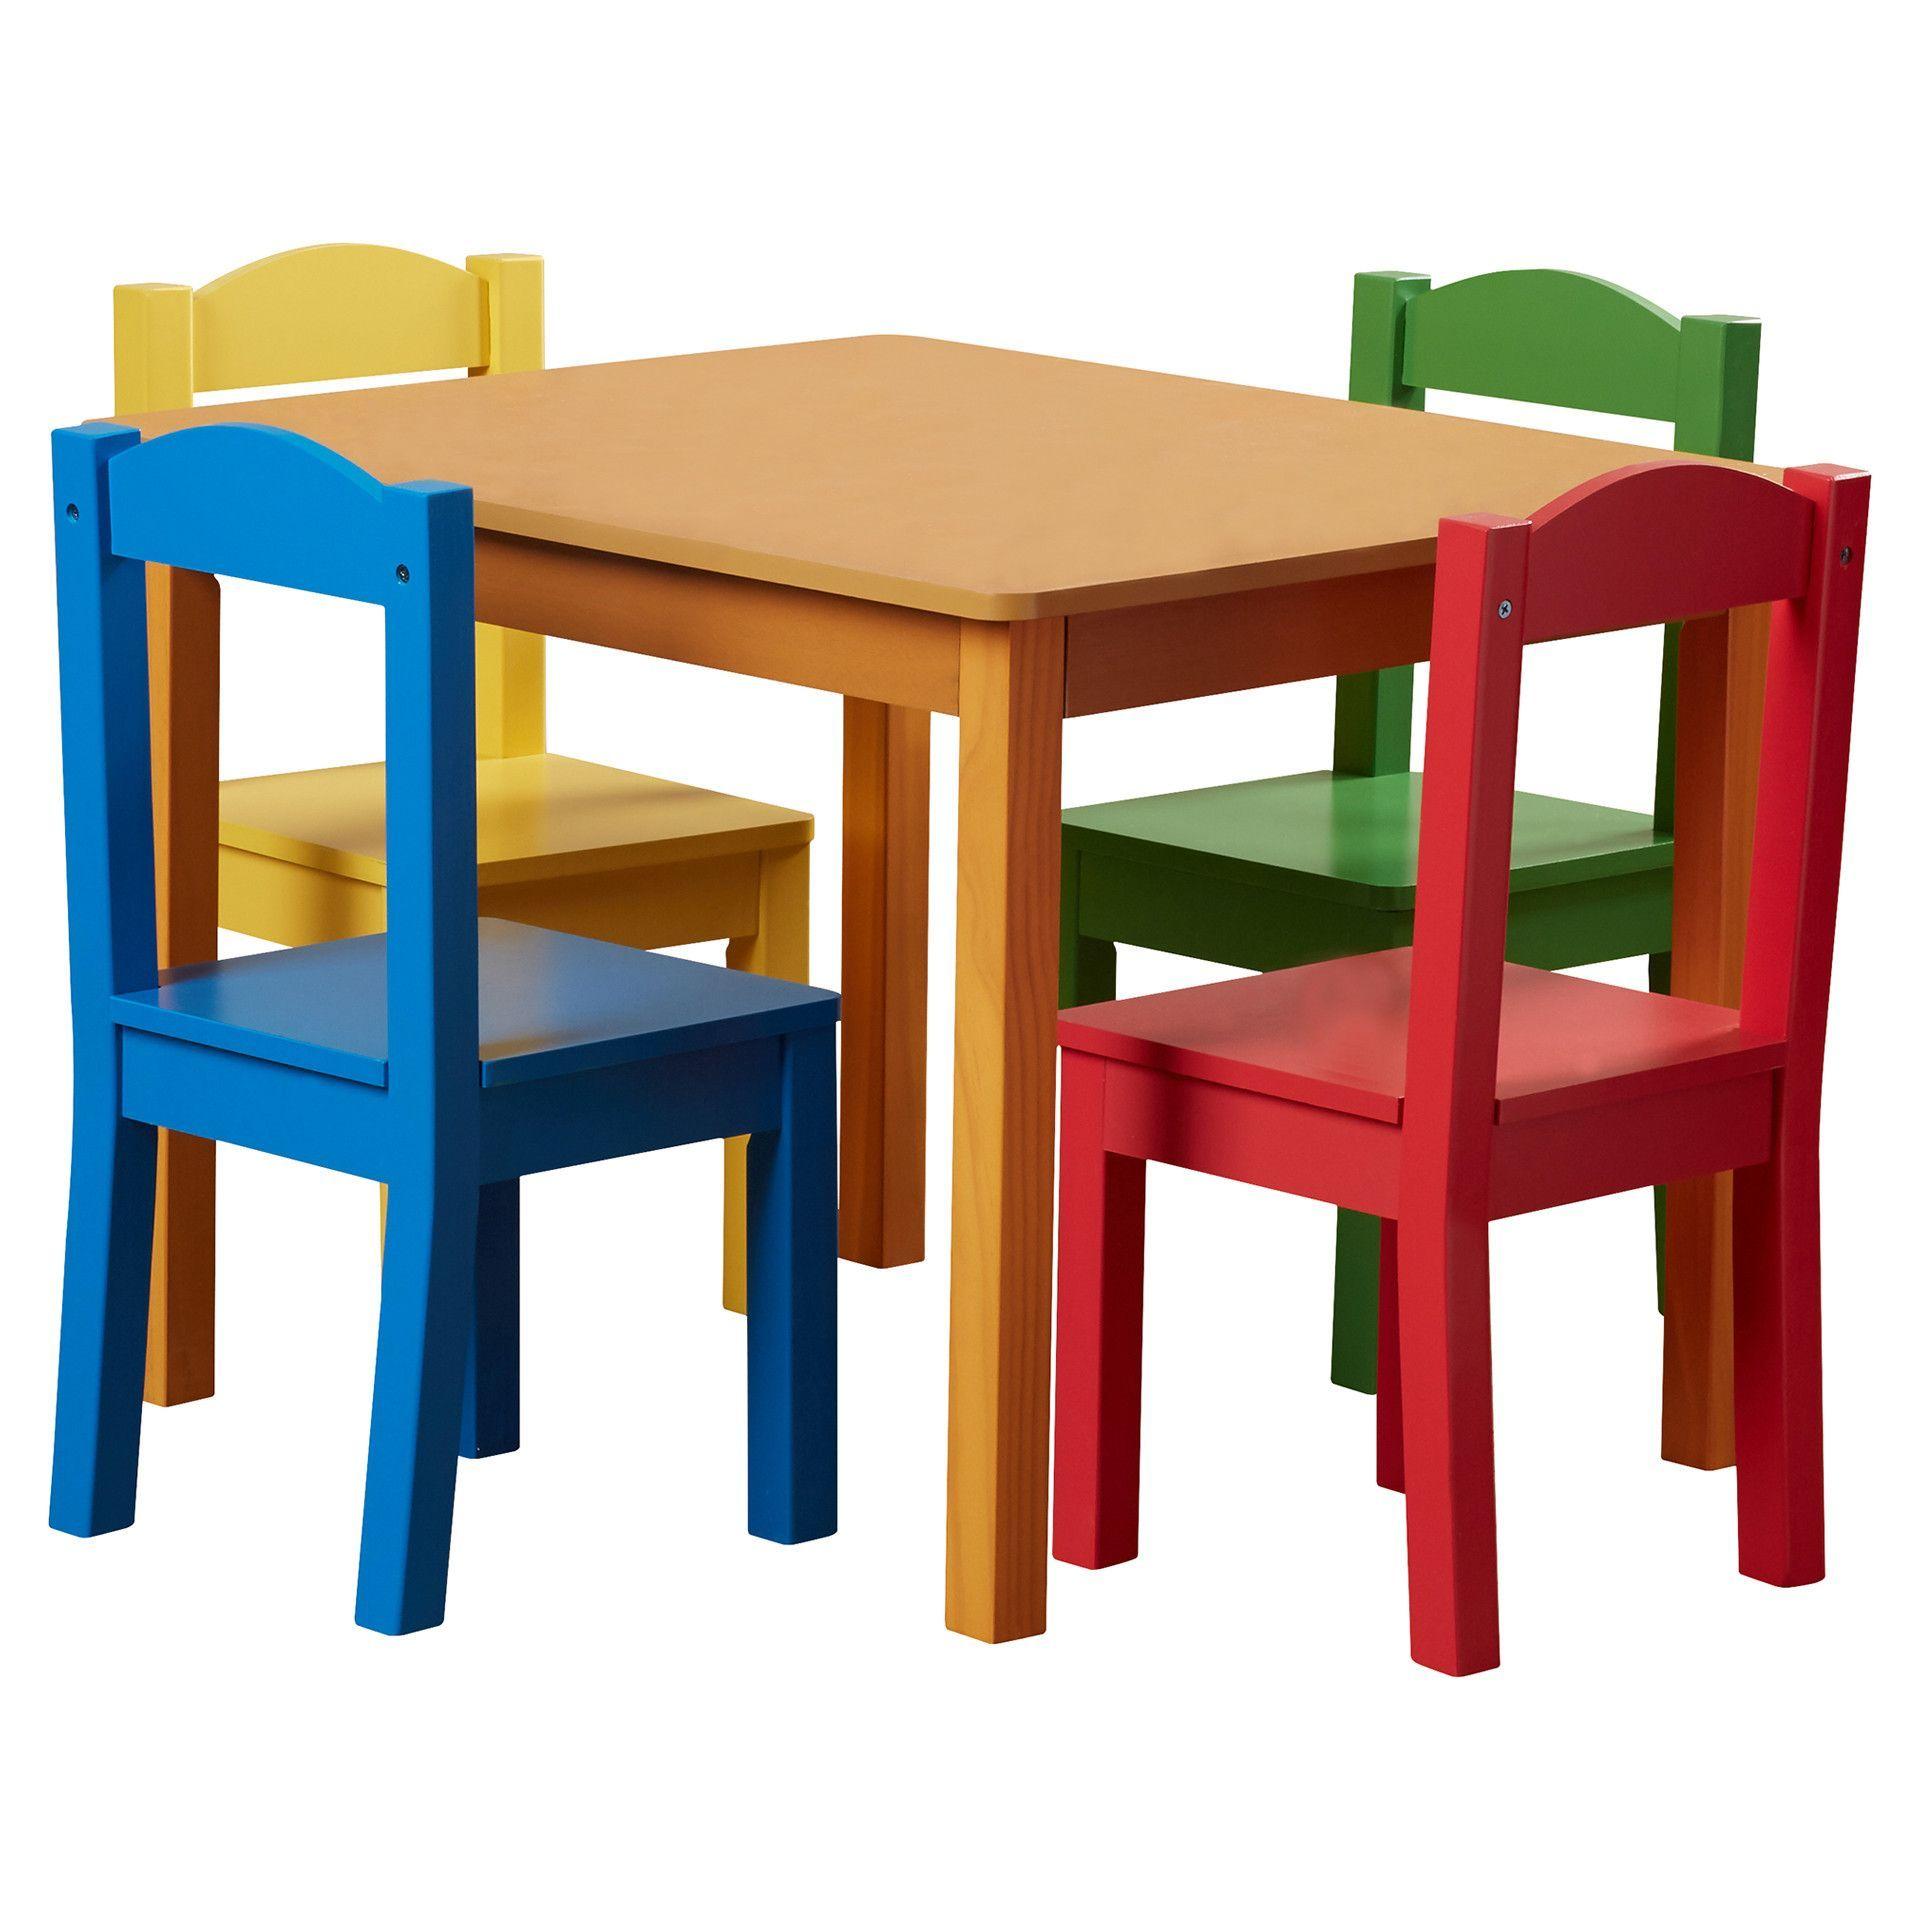 Zoomie Kids Samira Kids 5 Piece Table And Chair Set Kids Table And Chairs Table And Chairs Kids Table Chair Set